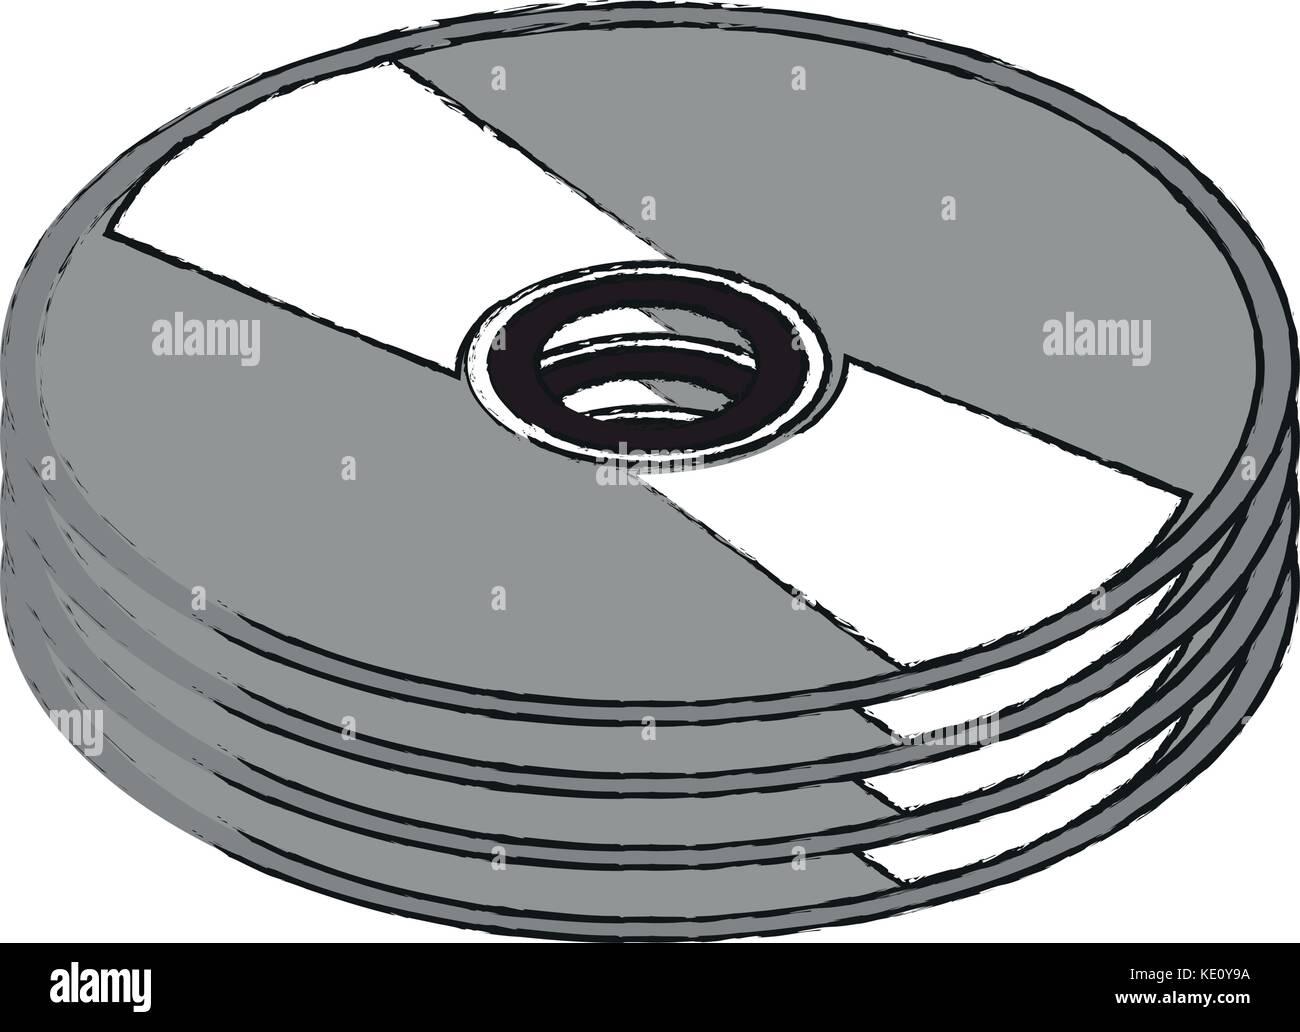 DVD cd rom - Stock Image